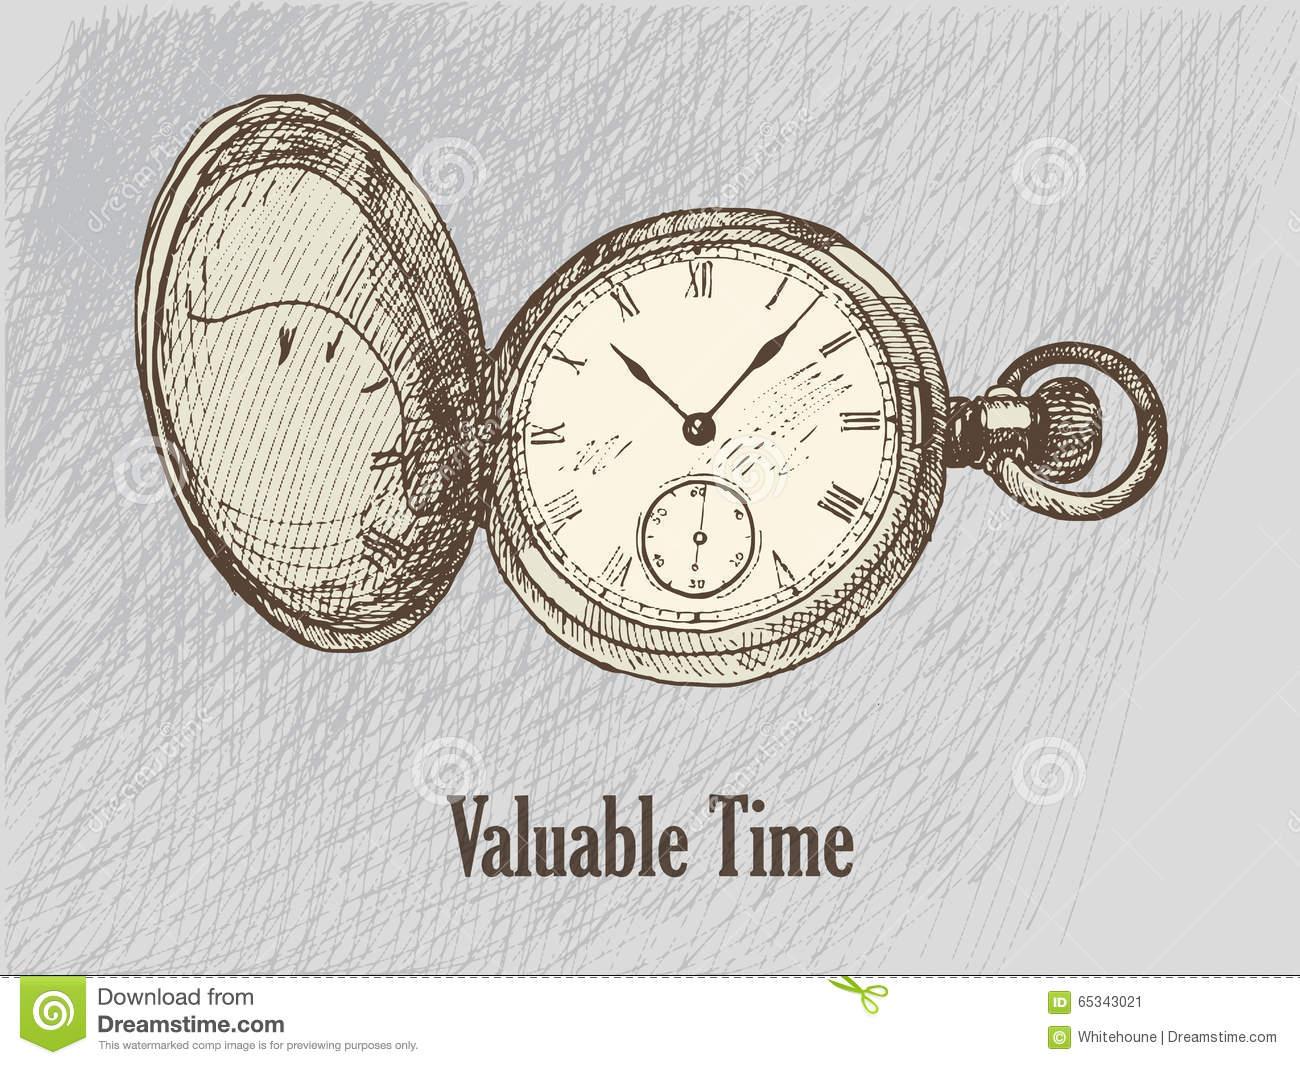 Dessin D'horloge De Wintage Illustration De Vecteur dedans Dessin D Horloge